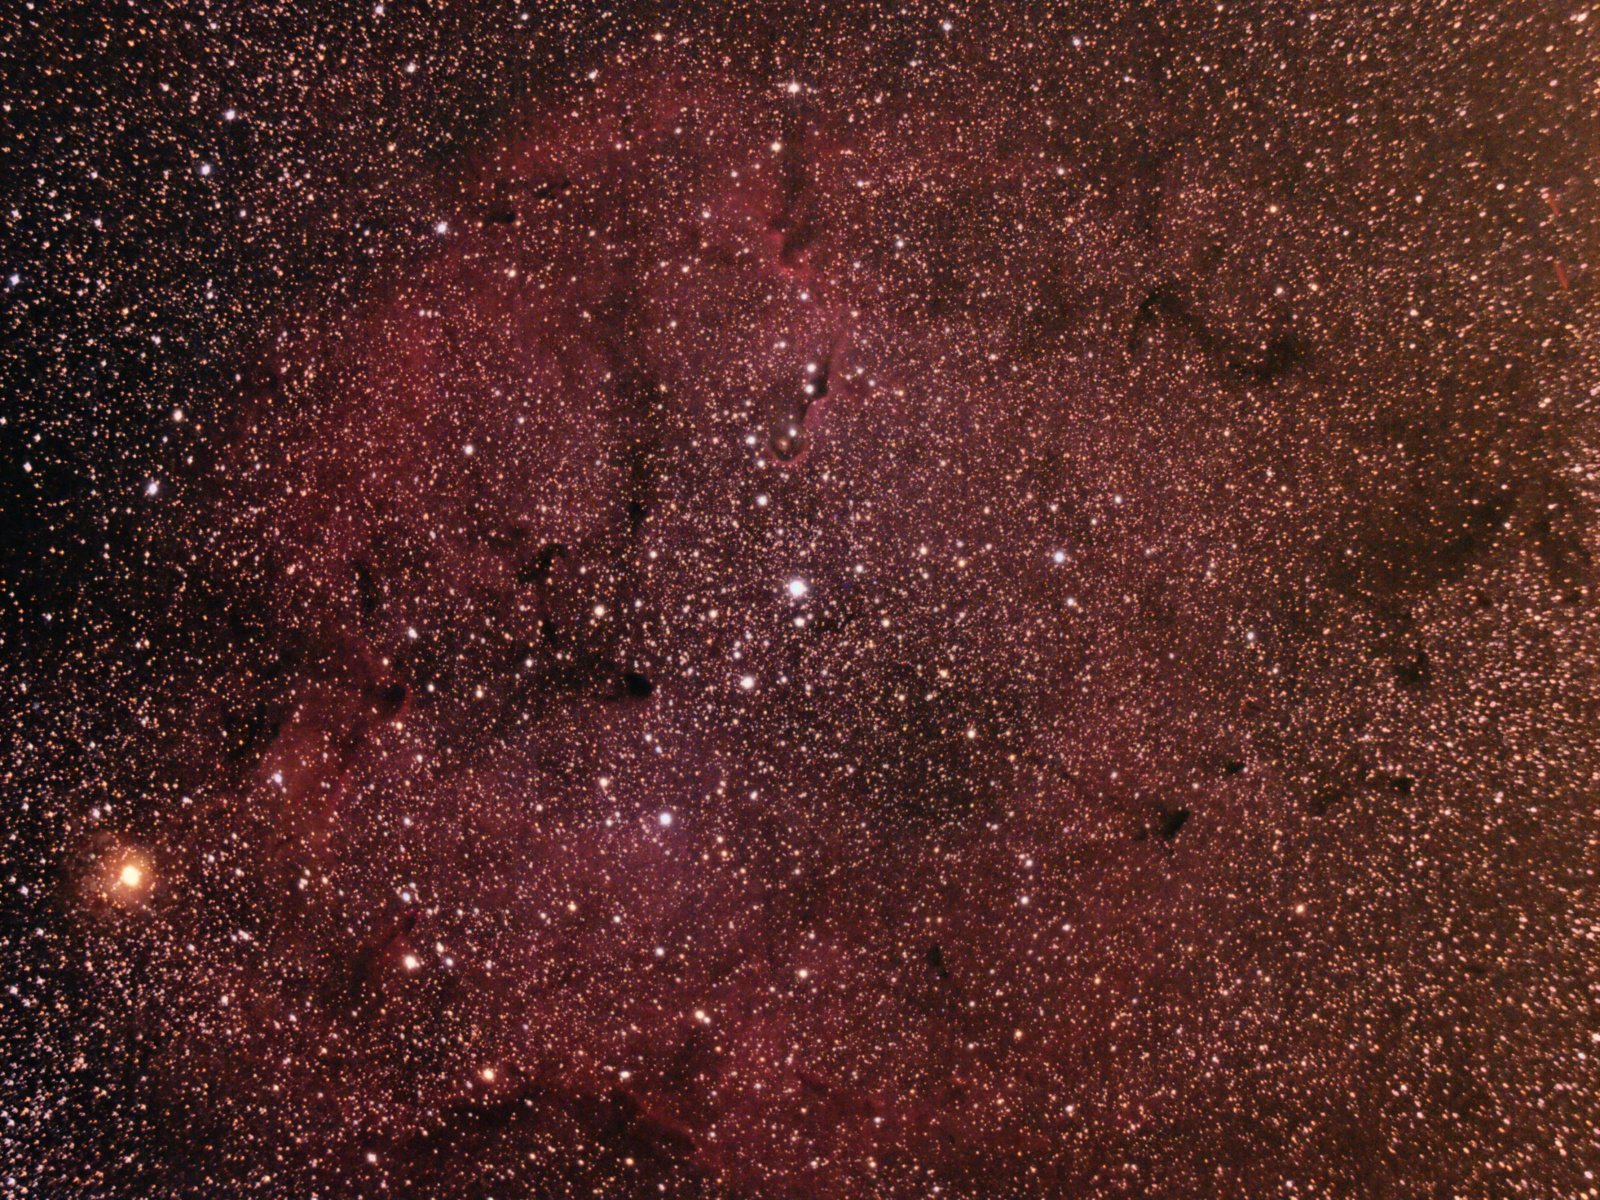 IC1396_stack2.thumb.jpg.433a70f099b2c7c8c0fa126361bdc8a3.jpg